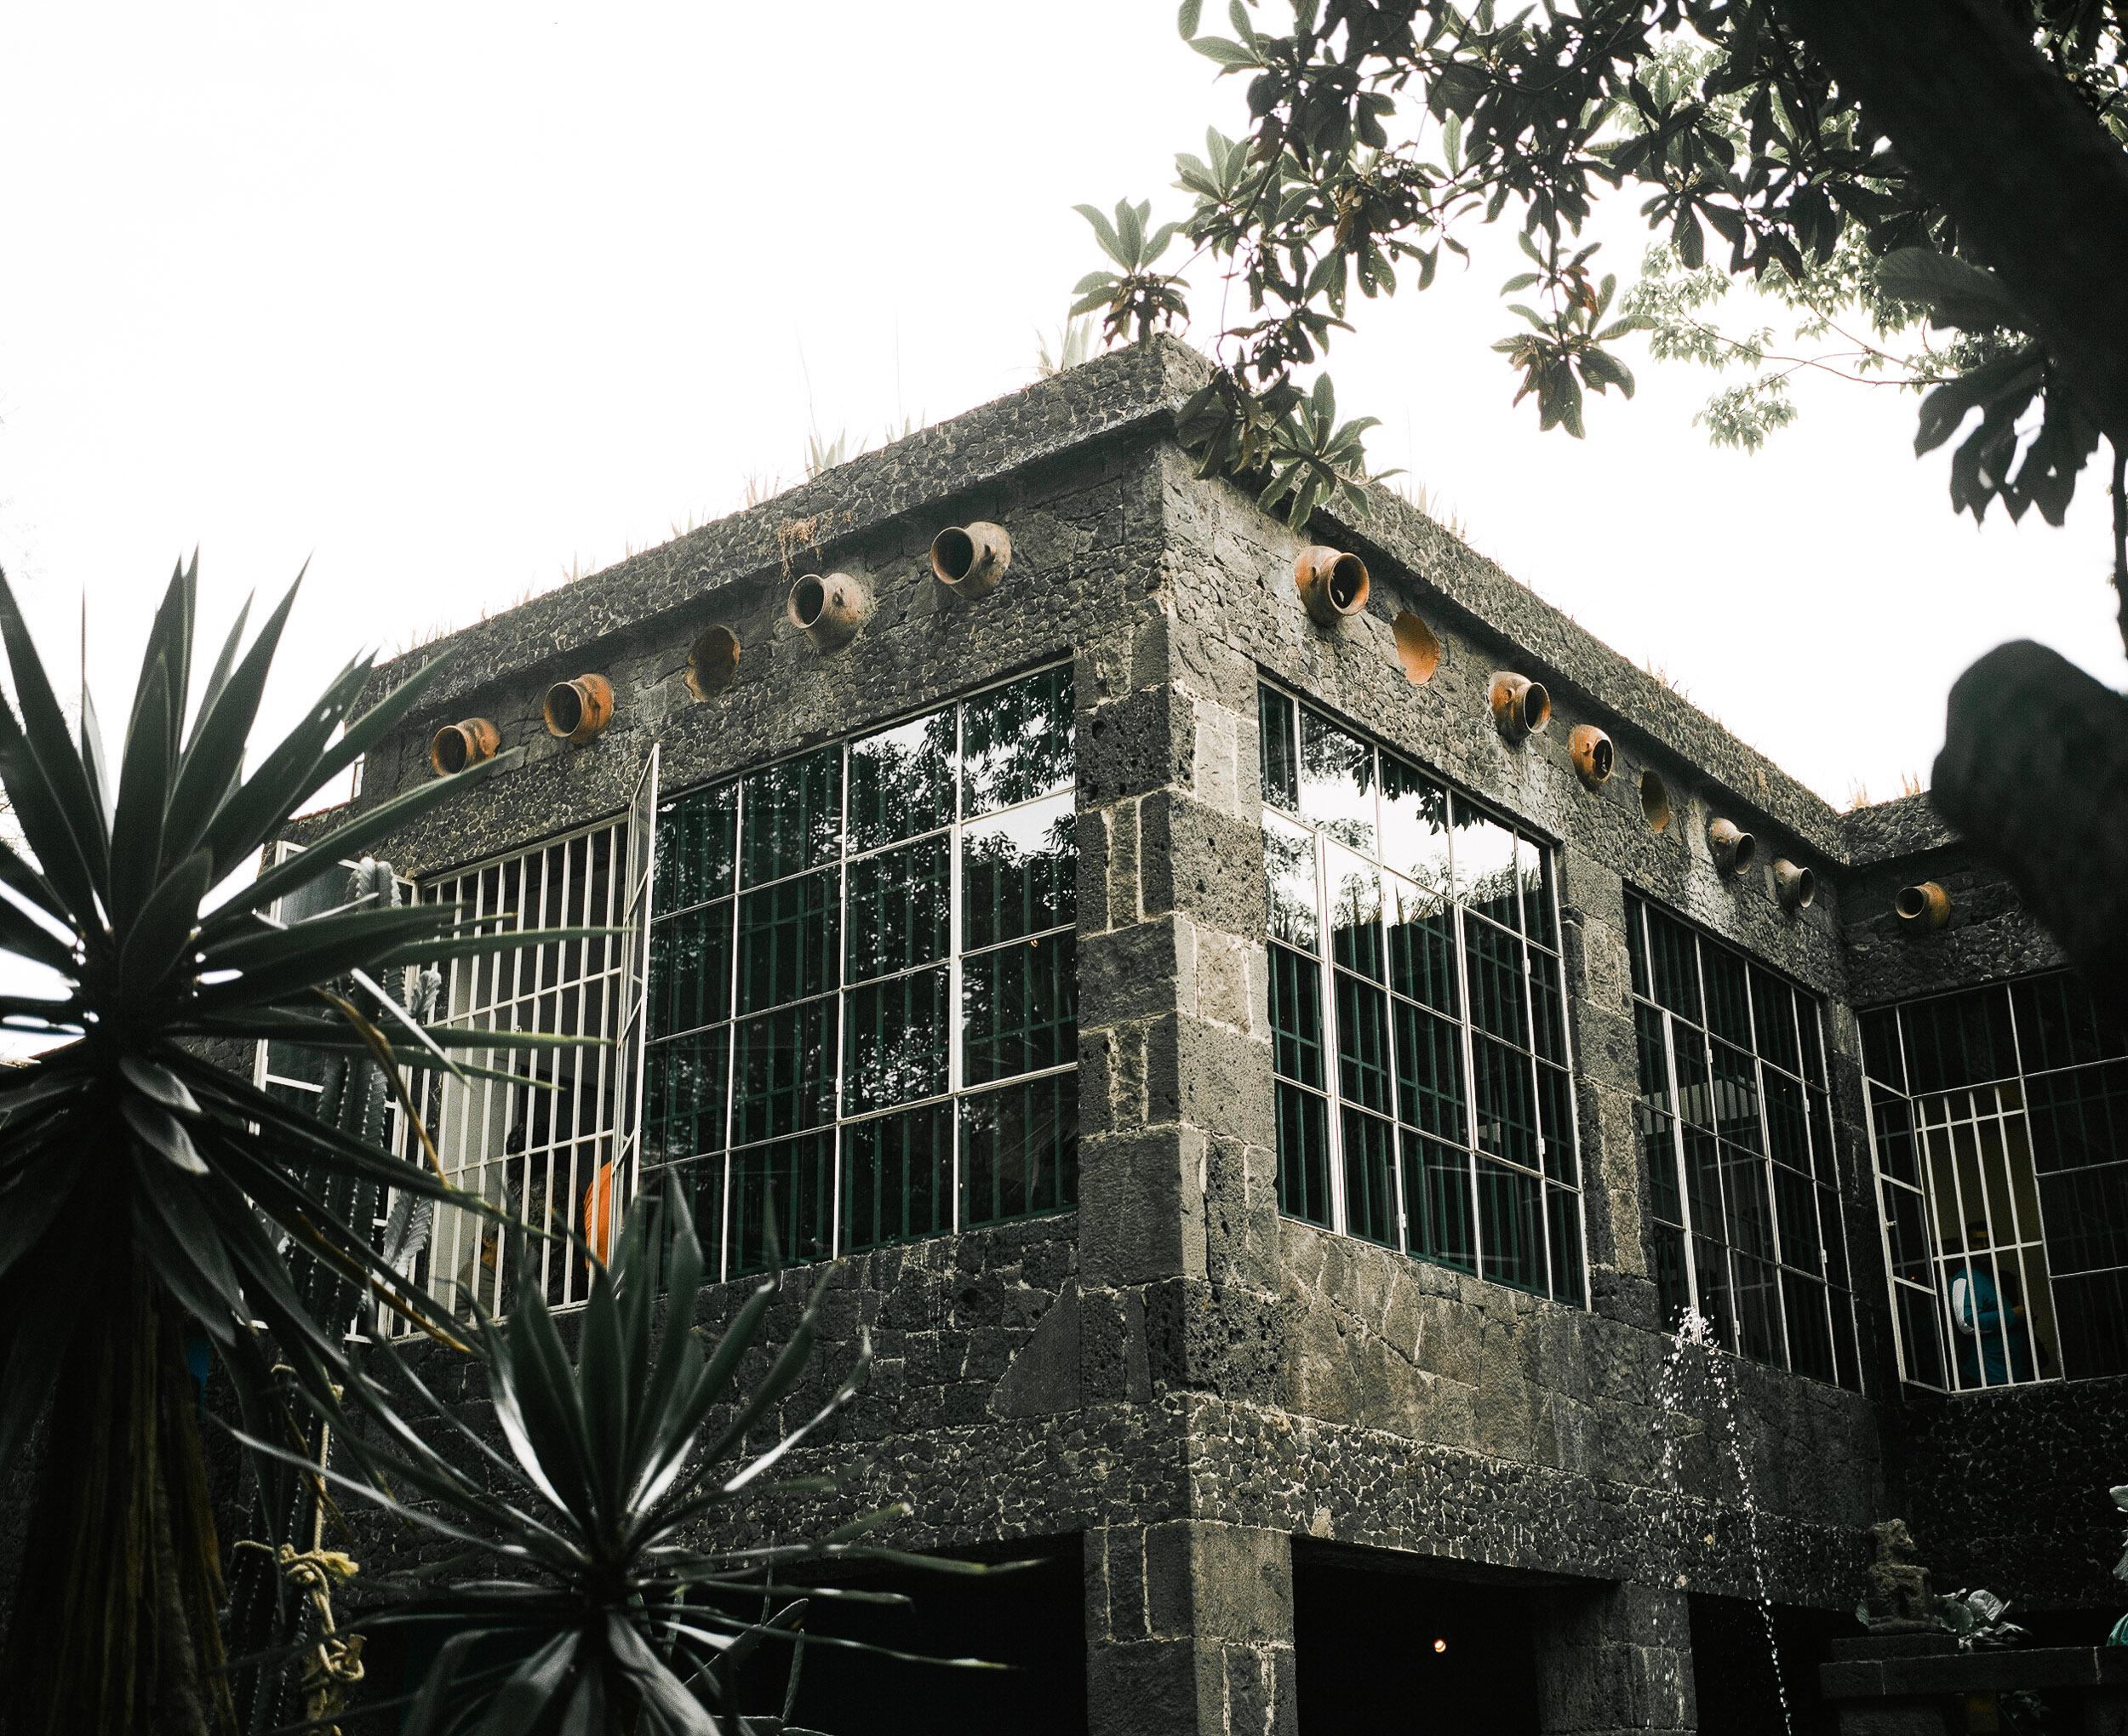 mexico_city_dAutremont_web_13.jpg